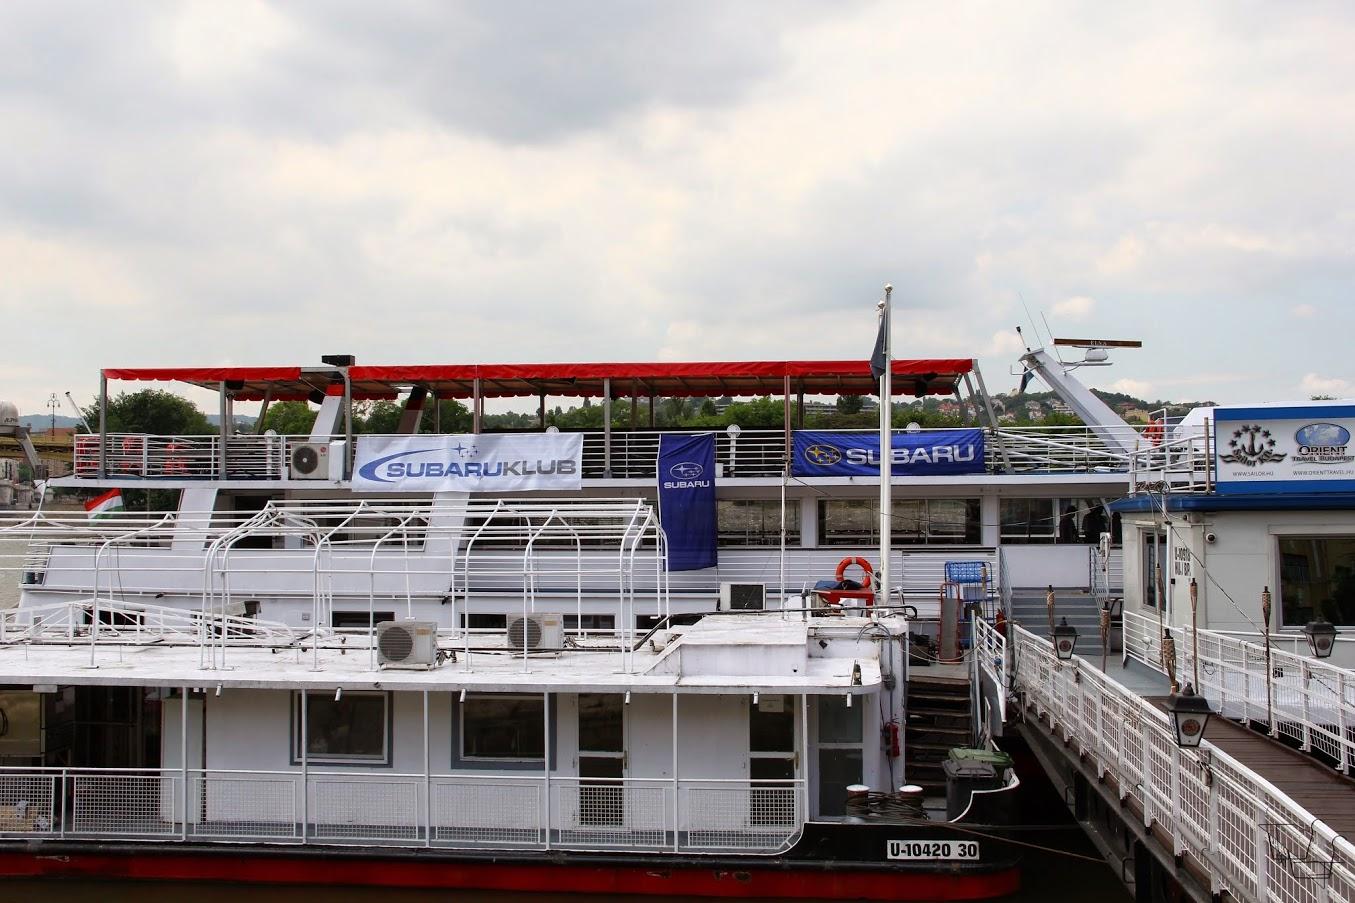 Dunai Hajózás a Subaru KLubbal 2015